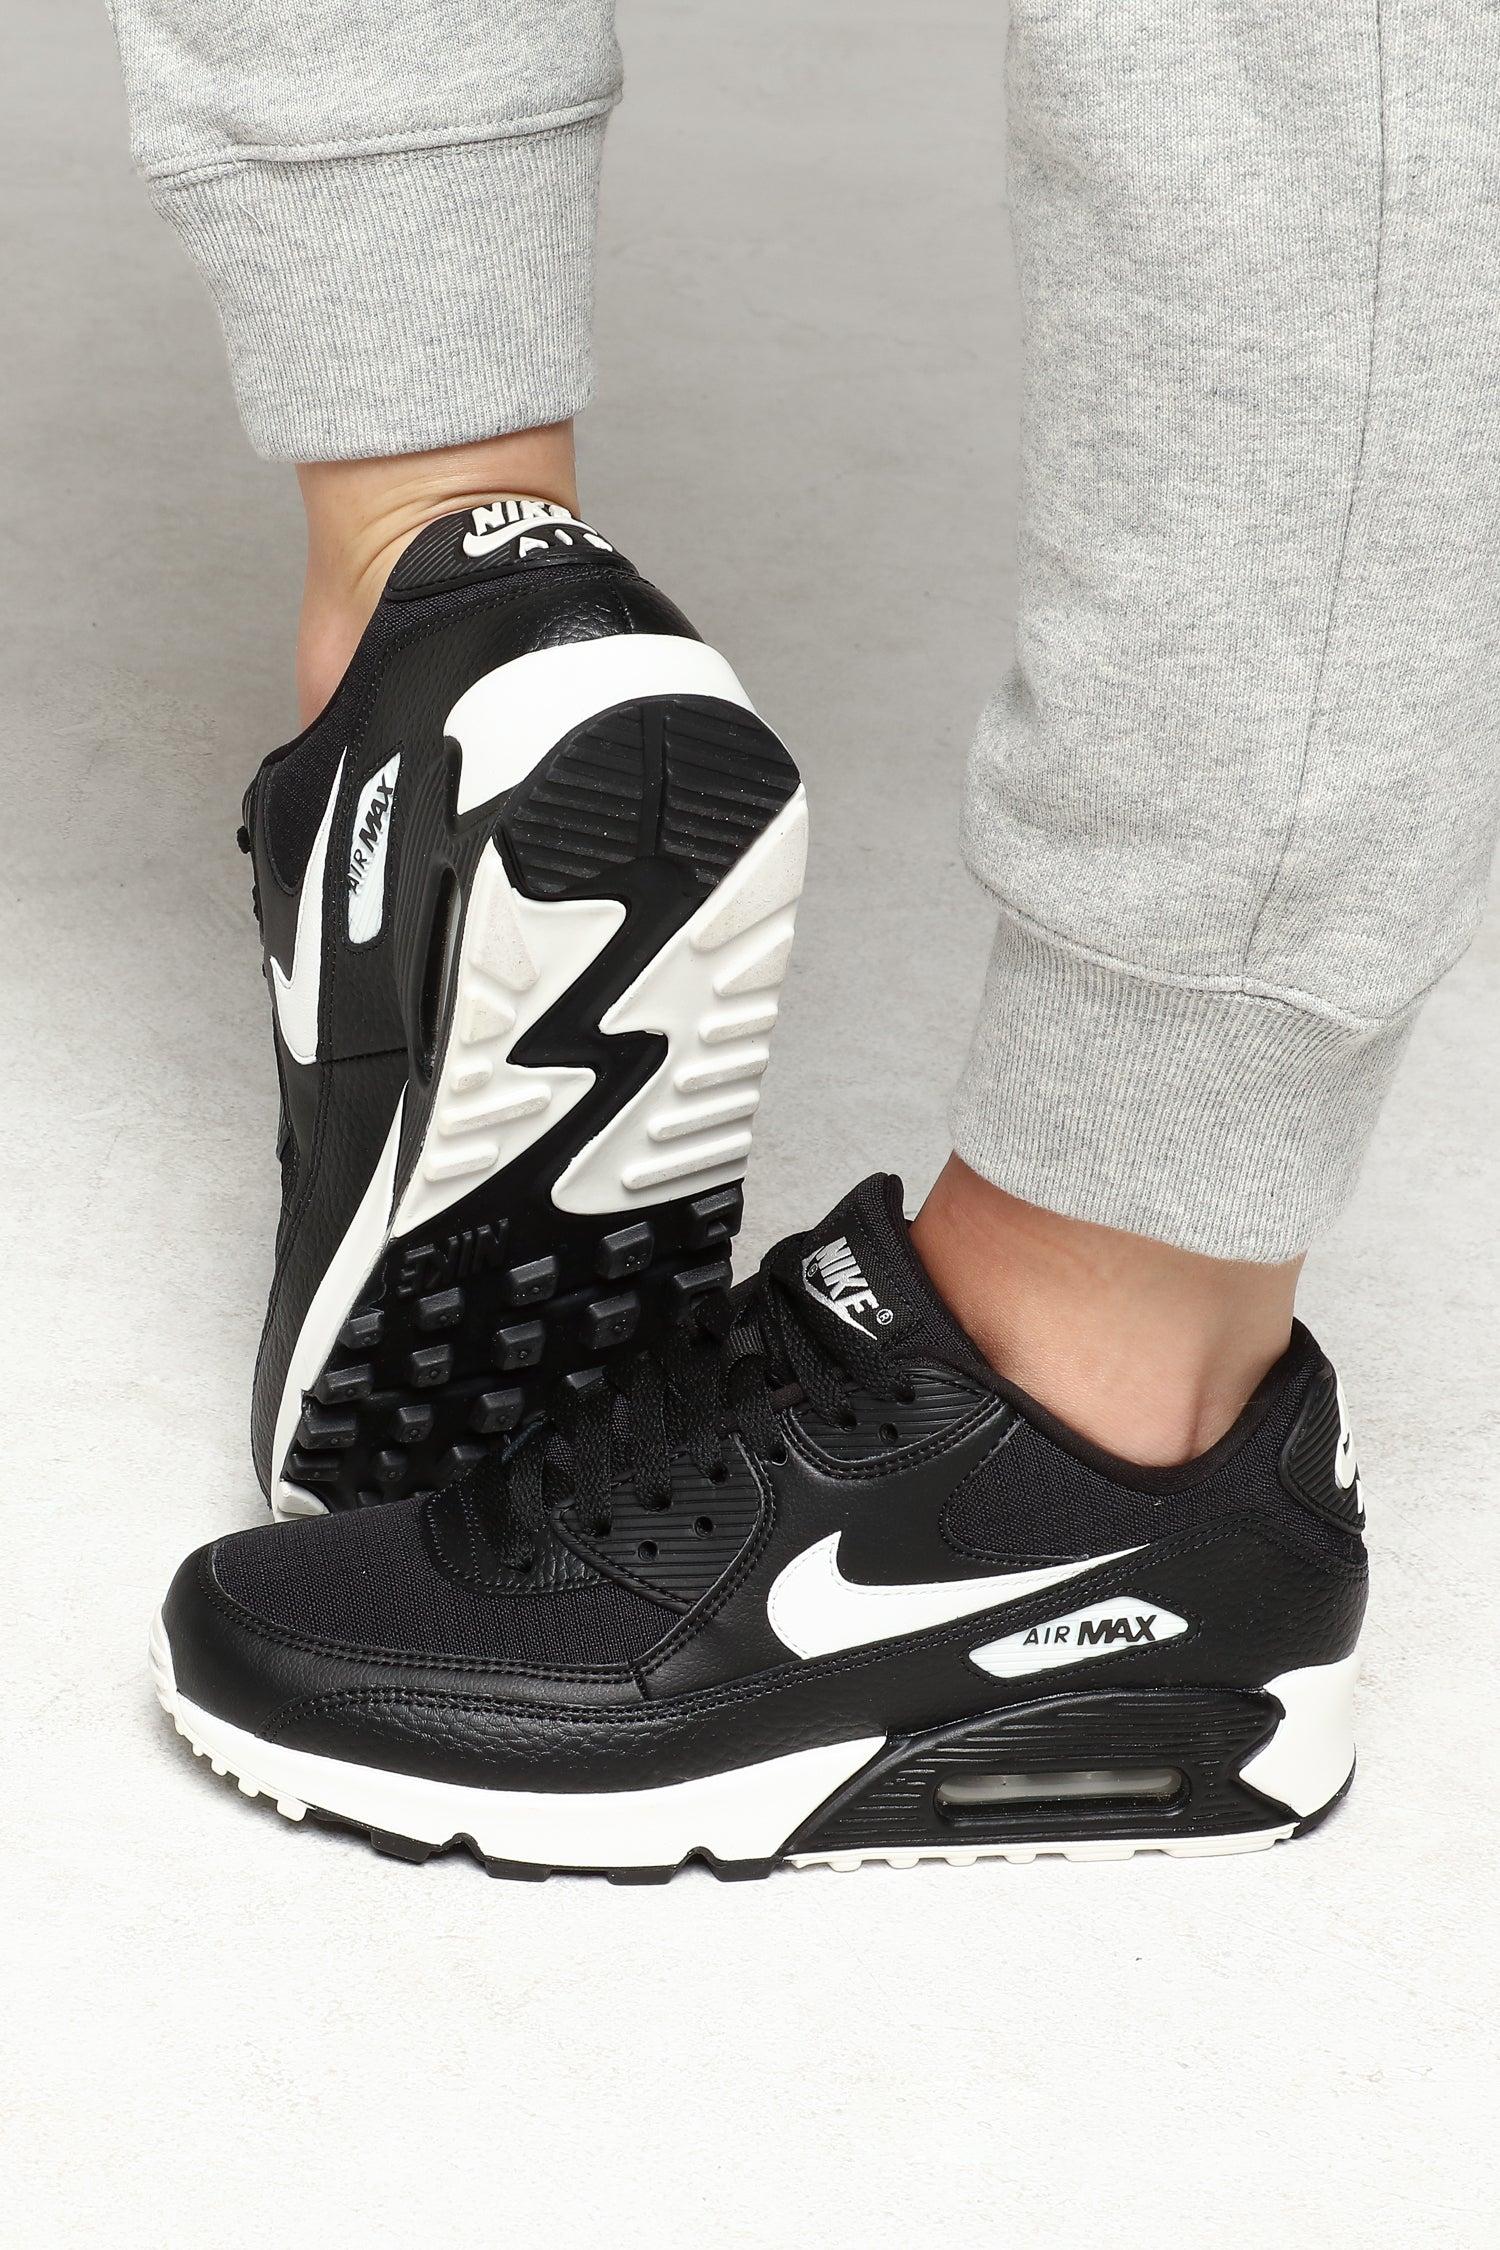 Nike Women's Air Max 90 BlackWhiteBlack